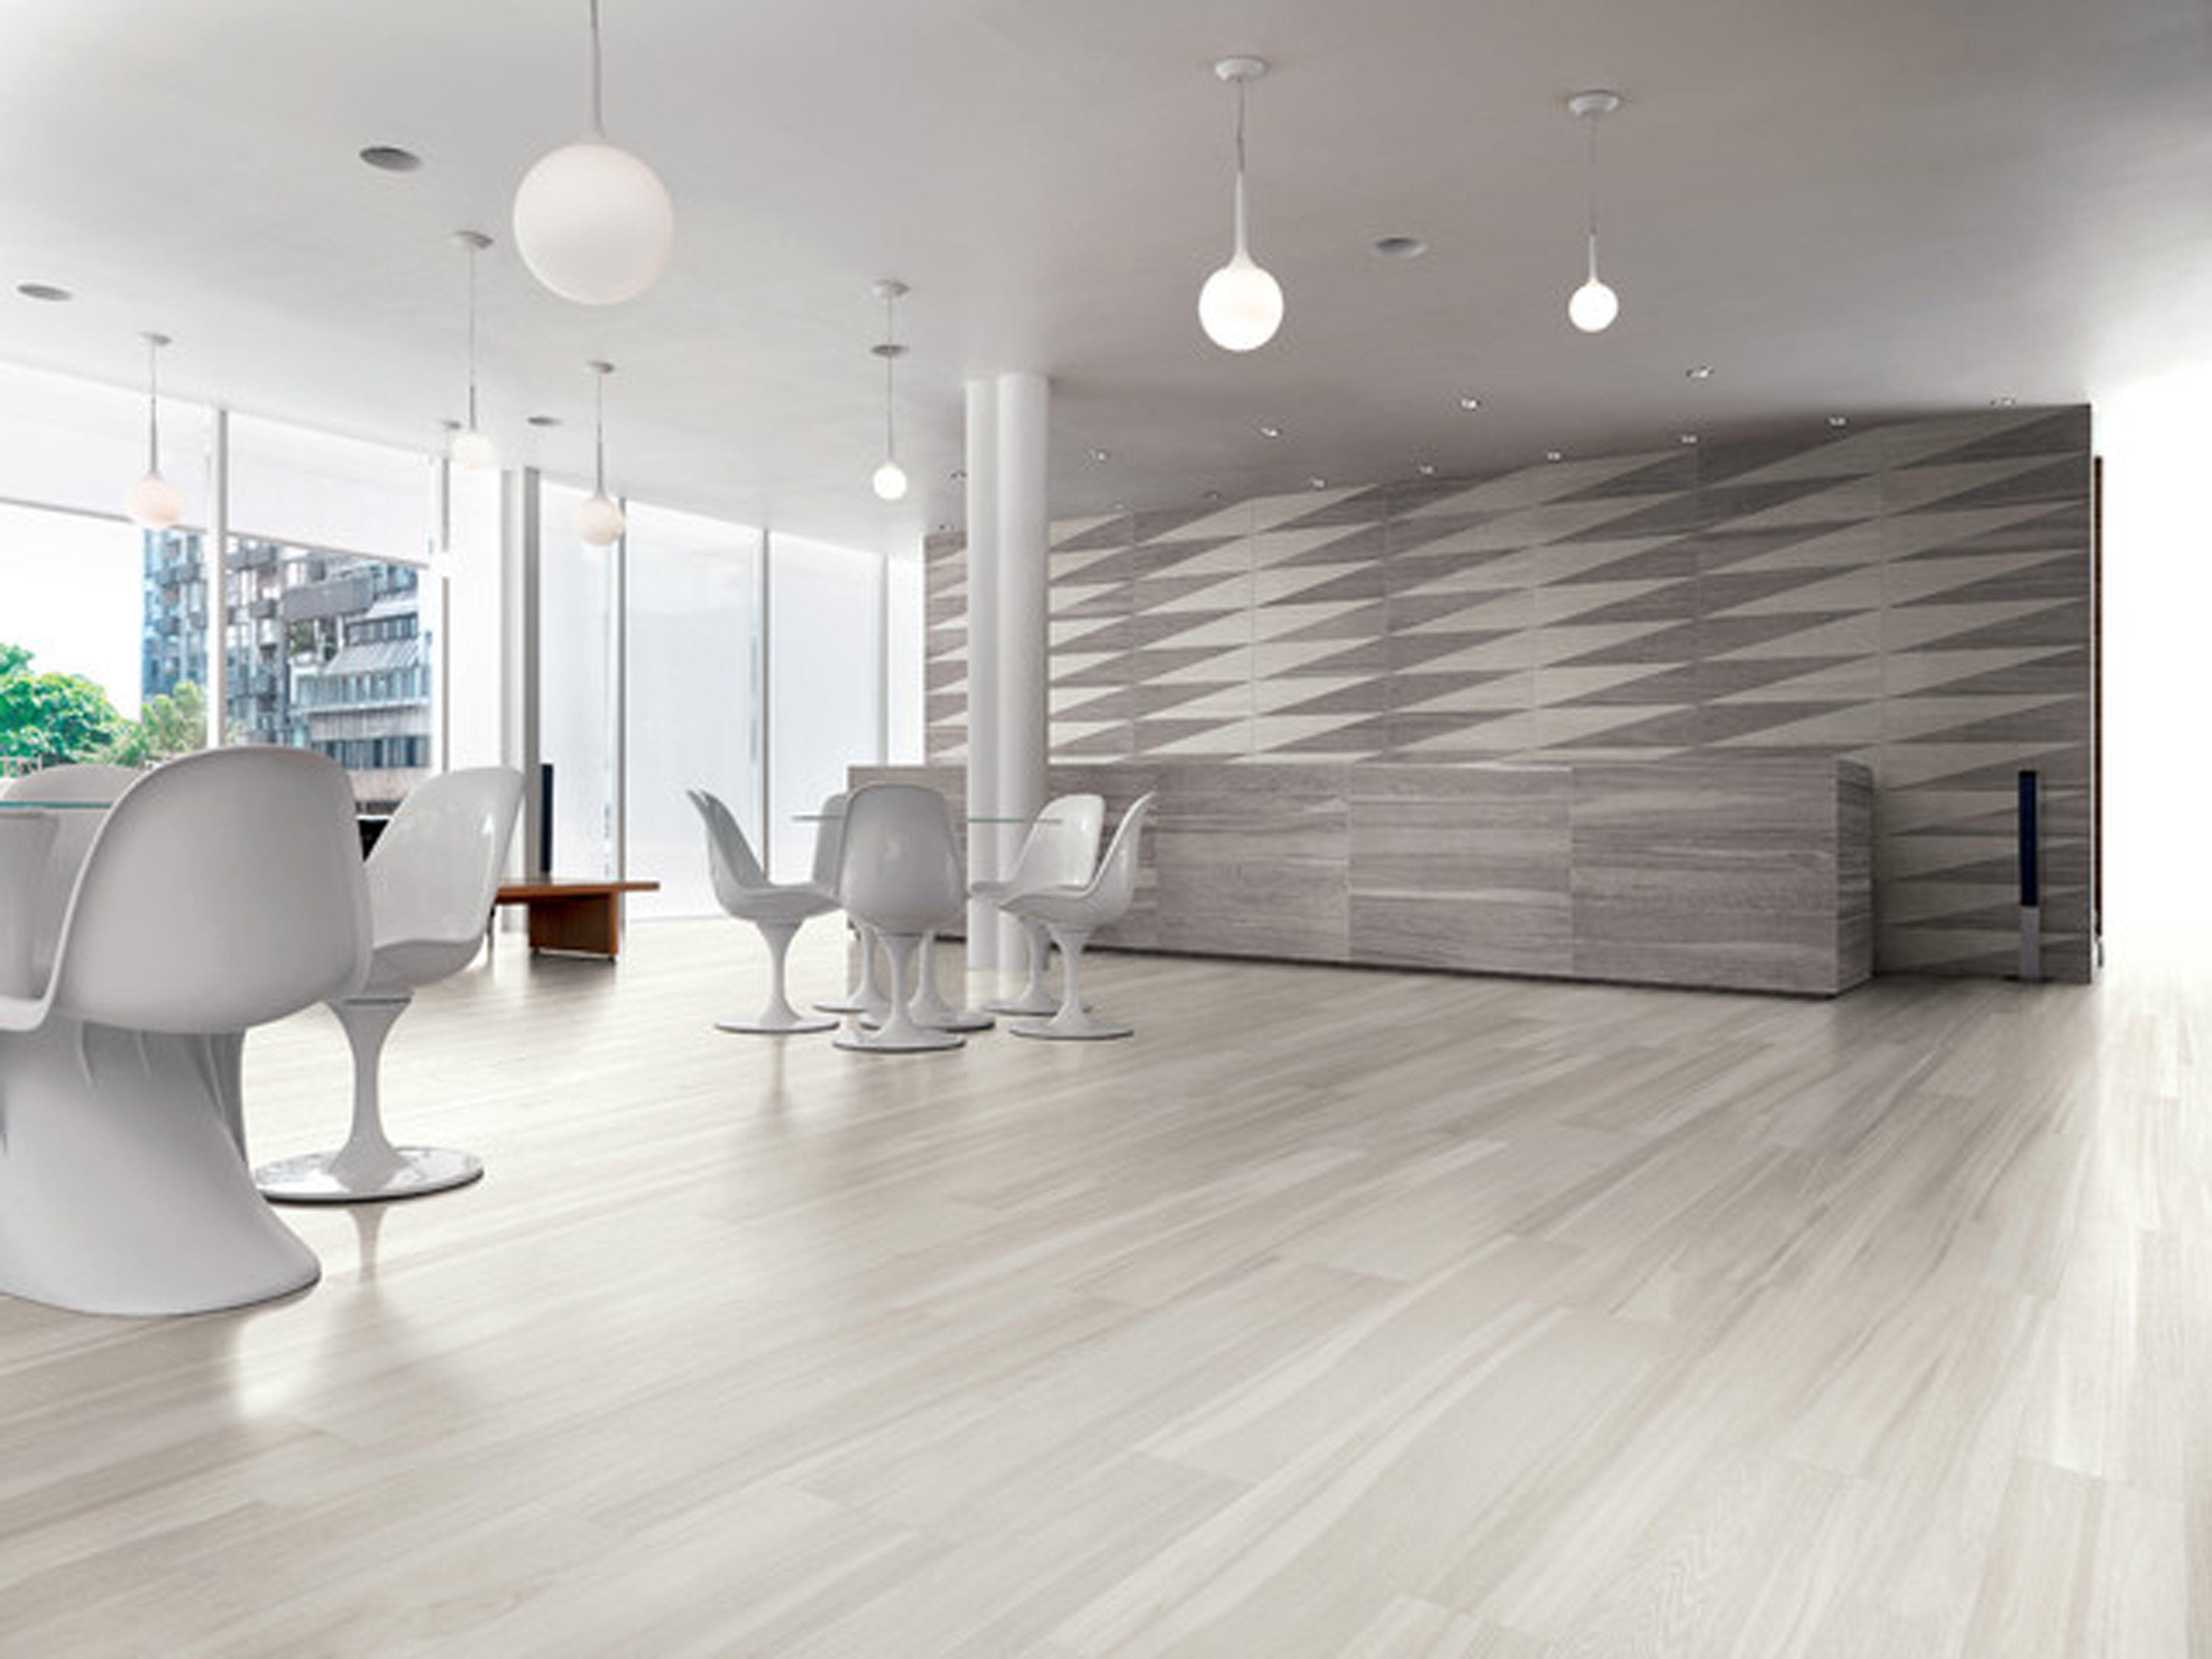 Wood plank tile lowes forfloor tiles contemporaryhome decorhome light wood look floor tile modern floor tiles los angeles tileshop dailygadgetfo Images